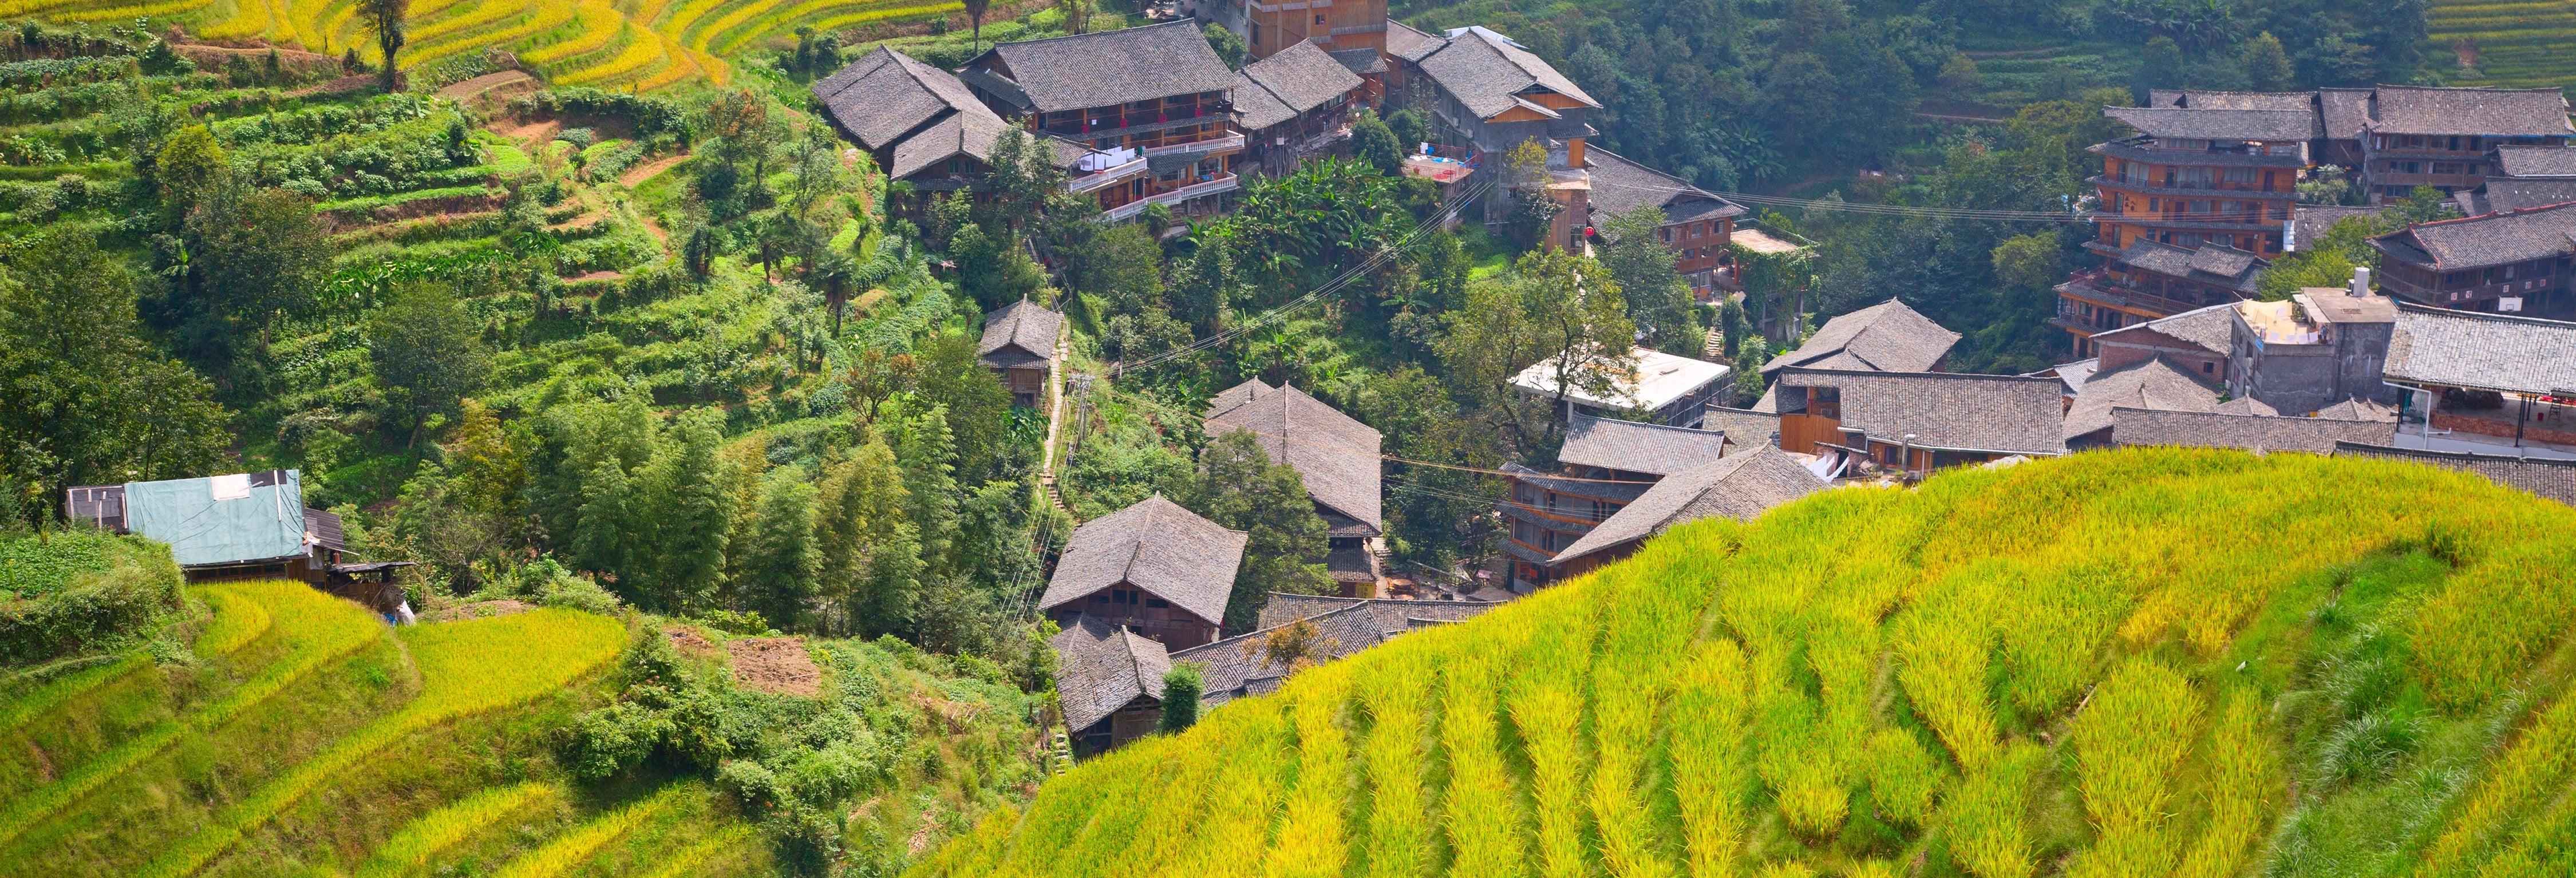 Tour por las terrazas de arroz